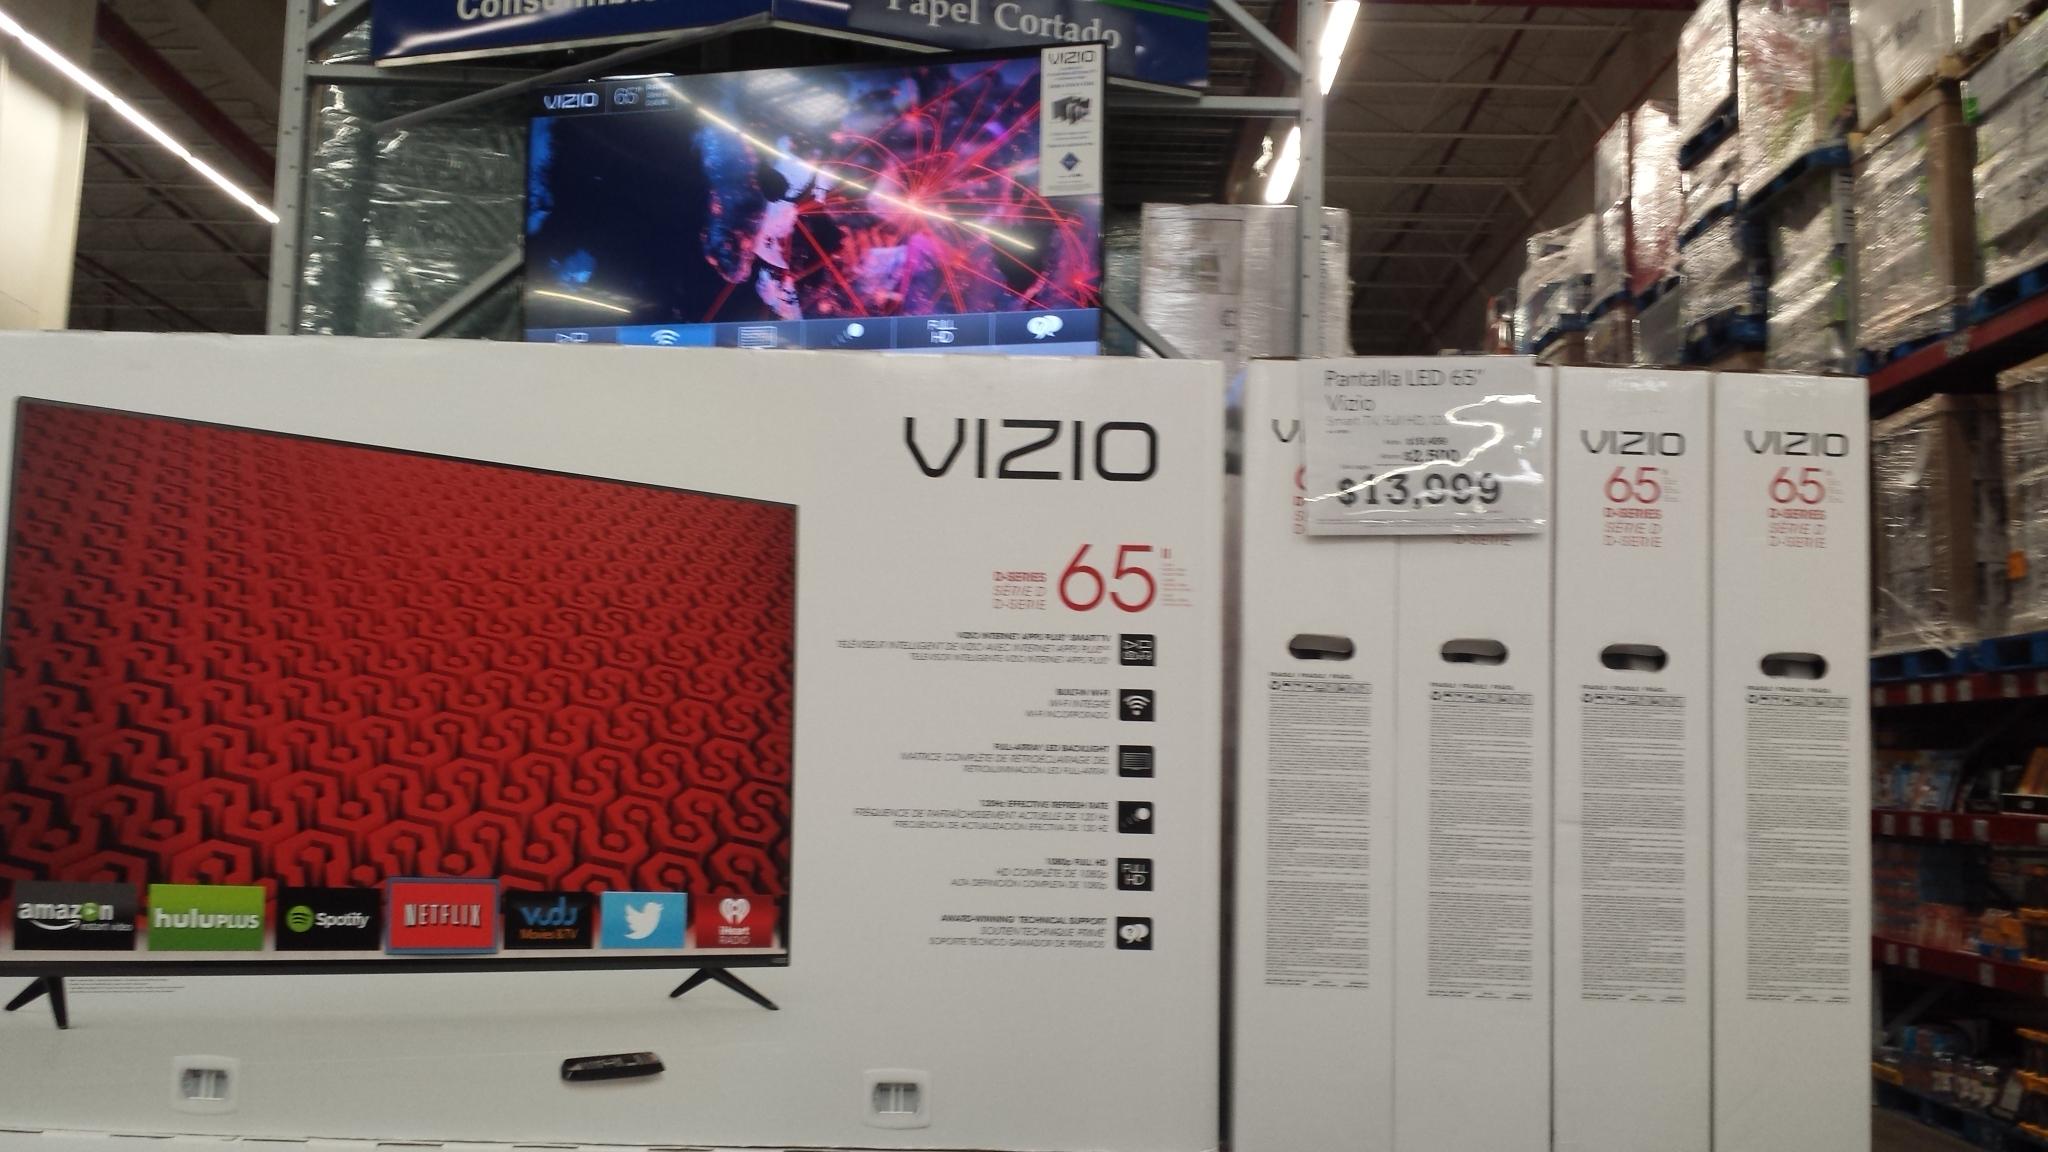 "Sam's Club: LED Smart TV Vizio 65"" $13,999"